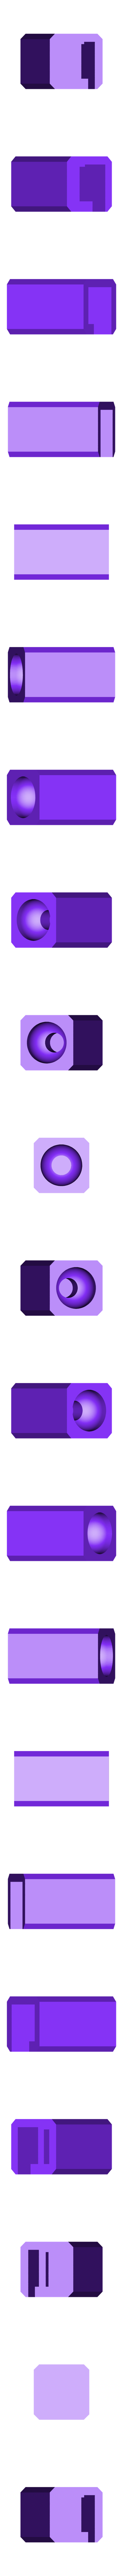 Arm_Lower_R_v2.STL Download STL file Low Poly Optimus Prime • Model to 3D print, biglildesign